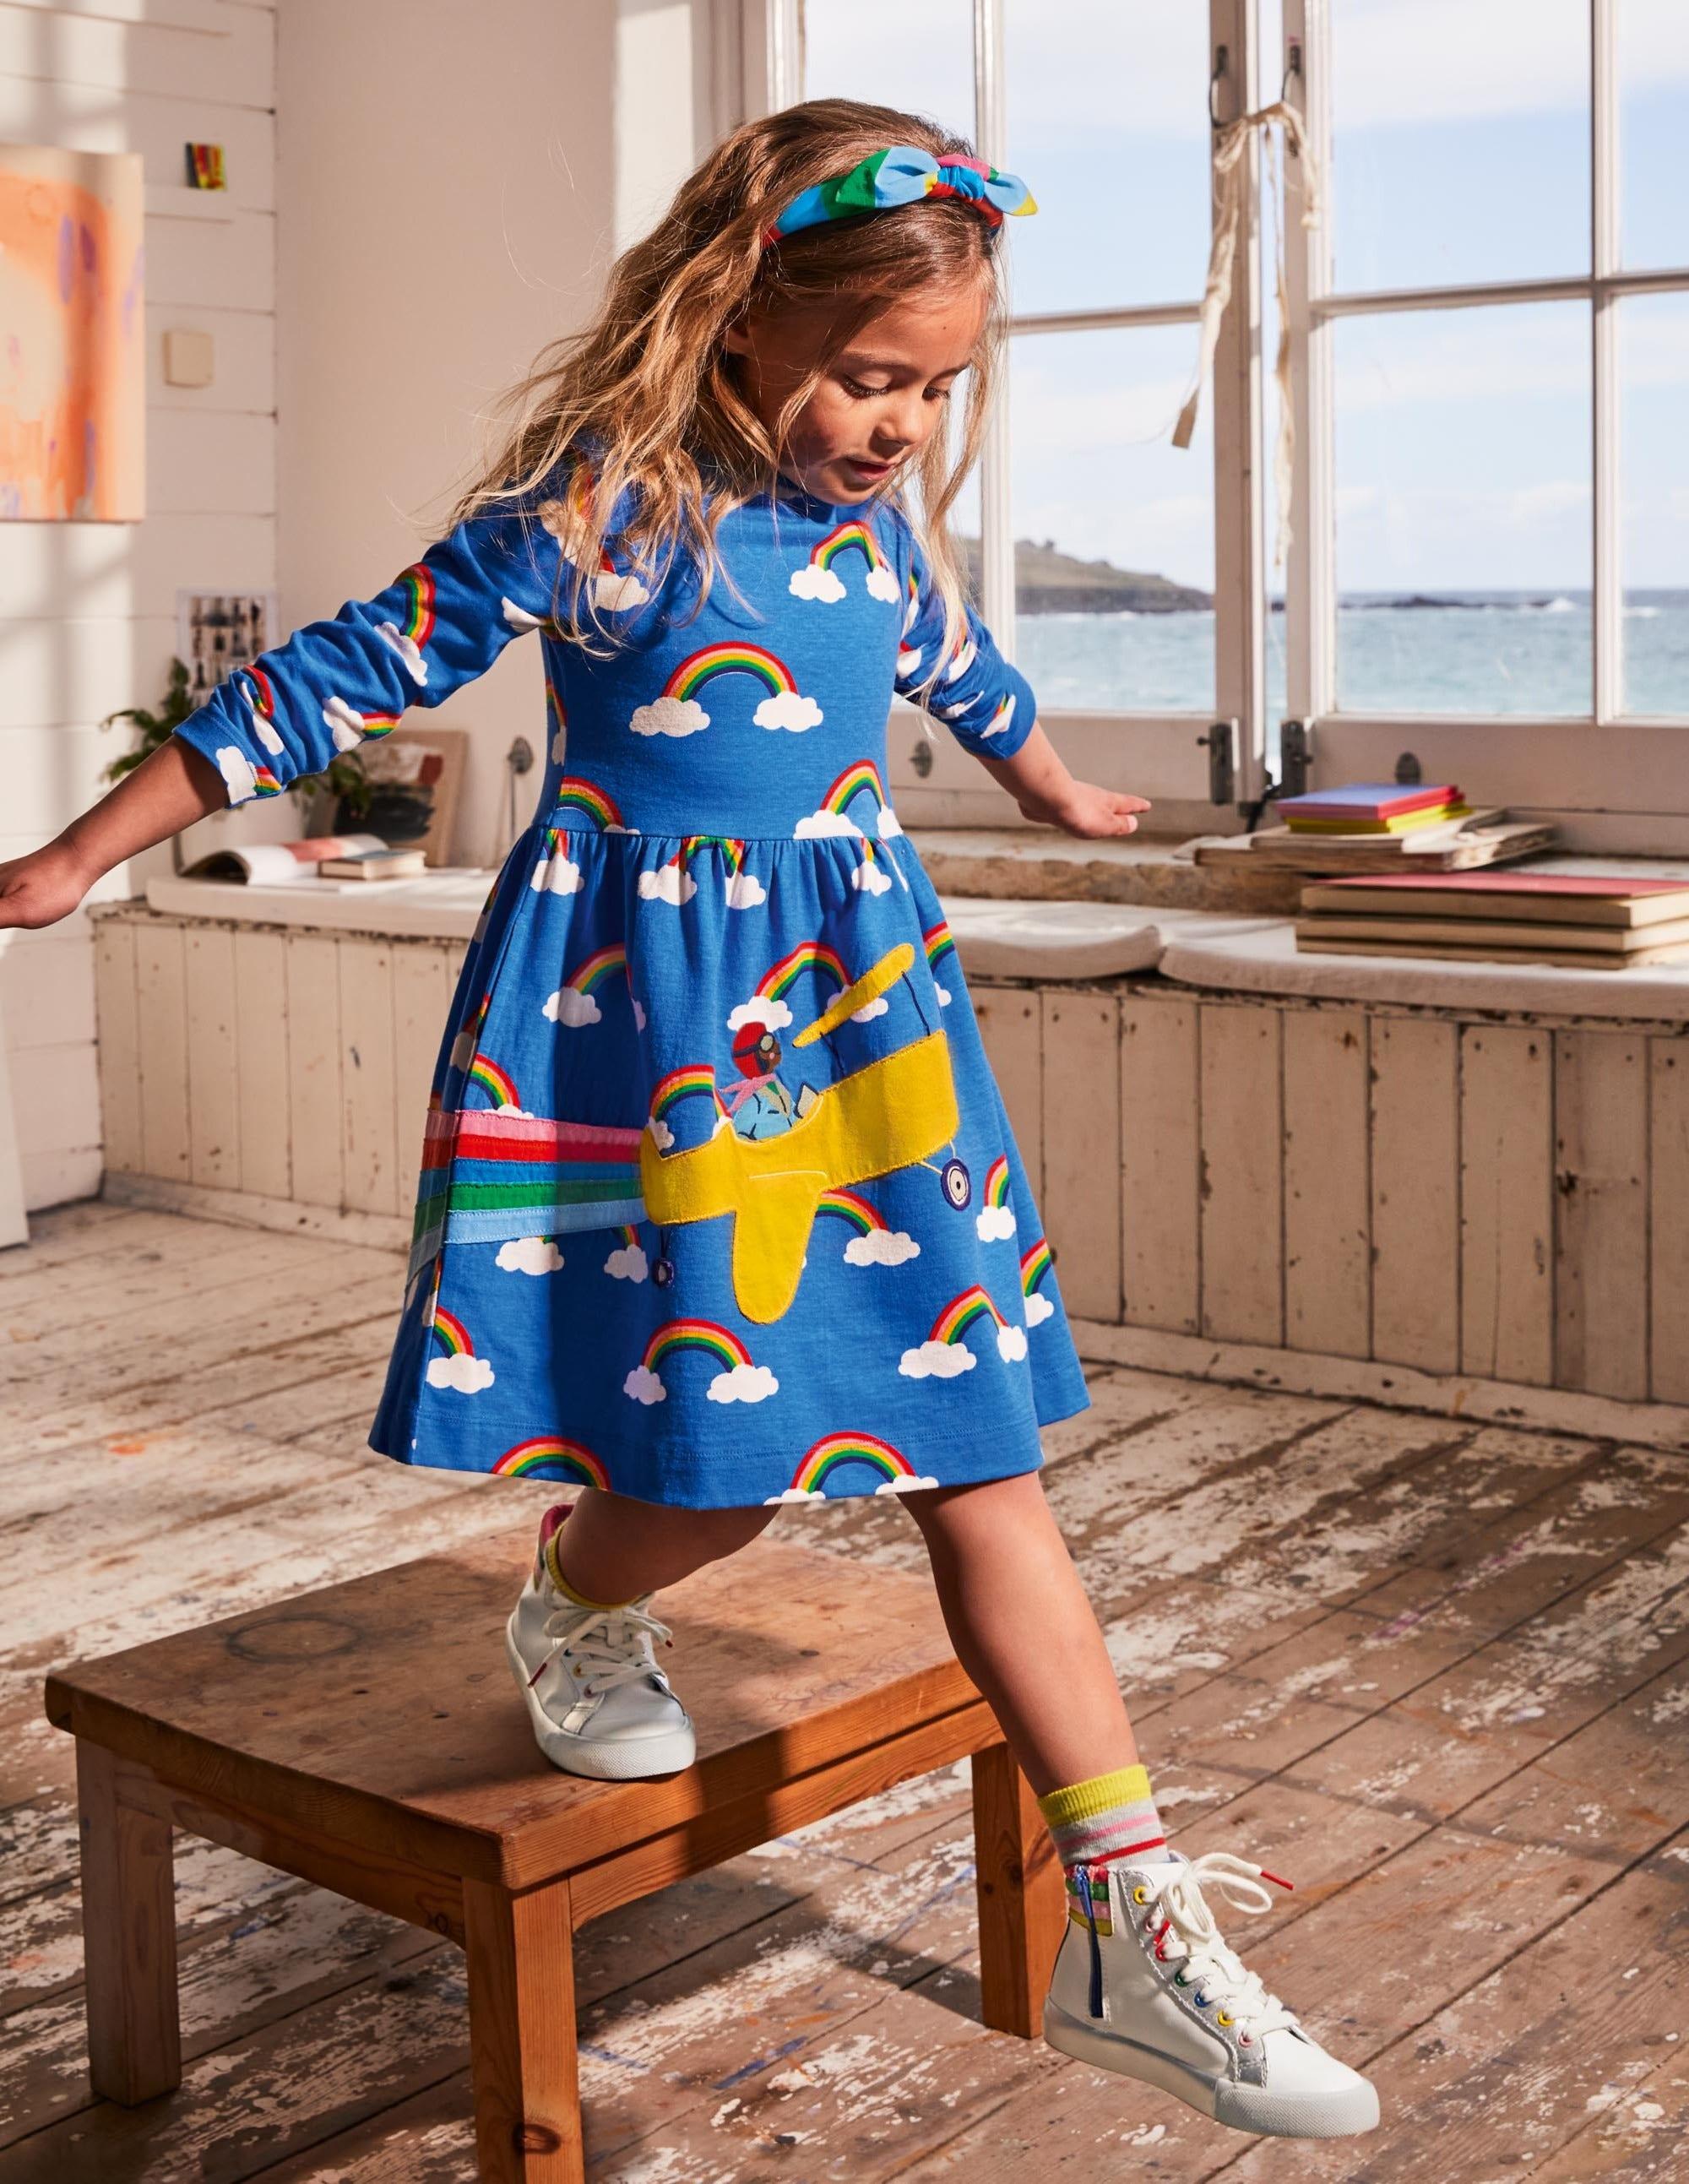 Boden Fun Applique Dress - Moroccan Blue Rainbow Cloud